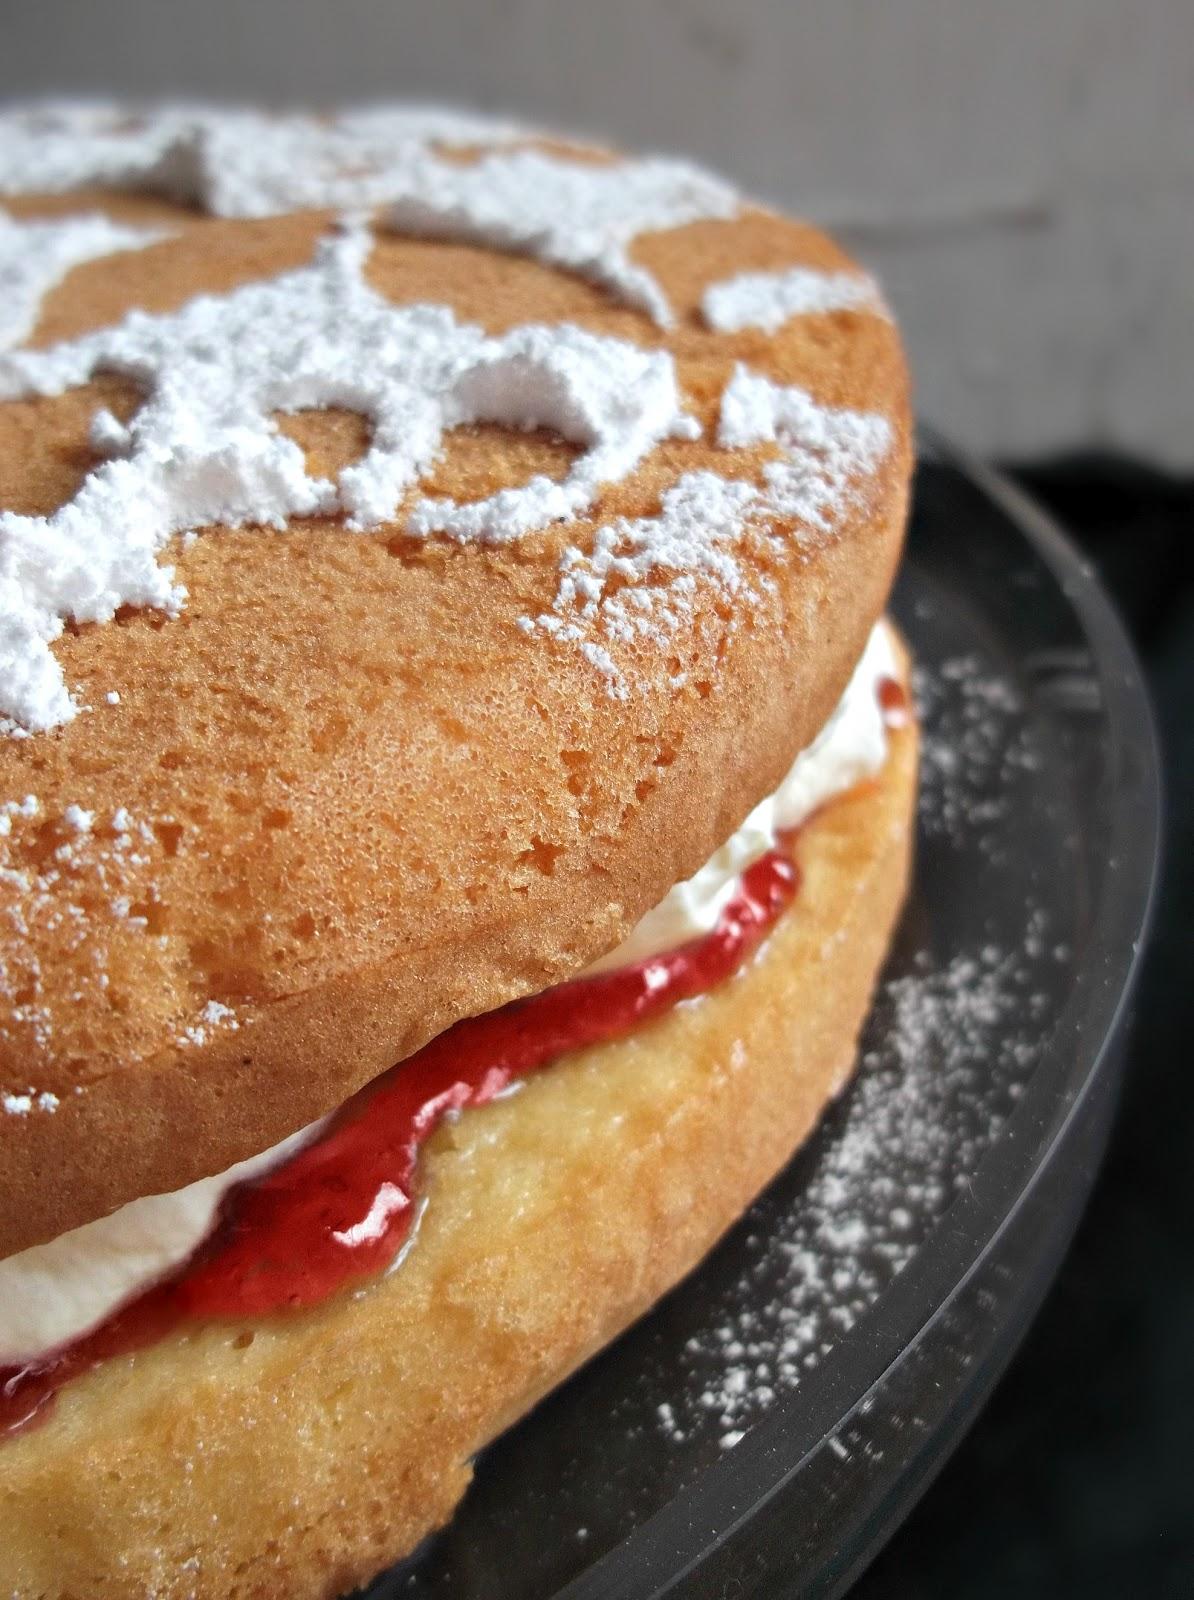 Lick The Spoon: 5 Minute Strawberry Cream Sponge Cake